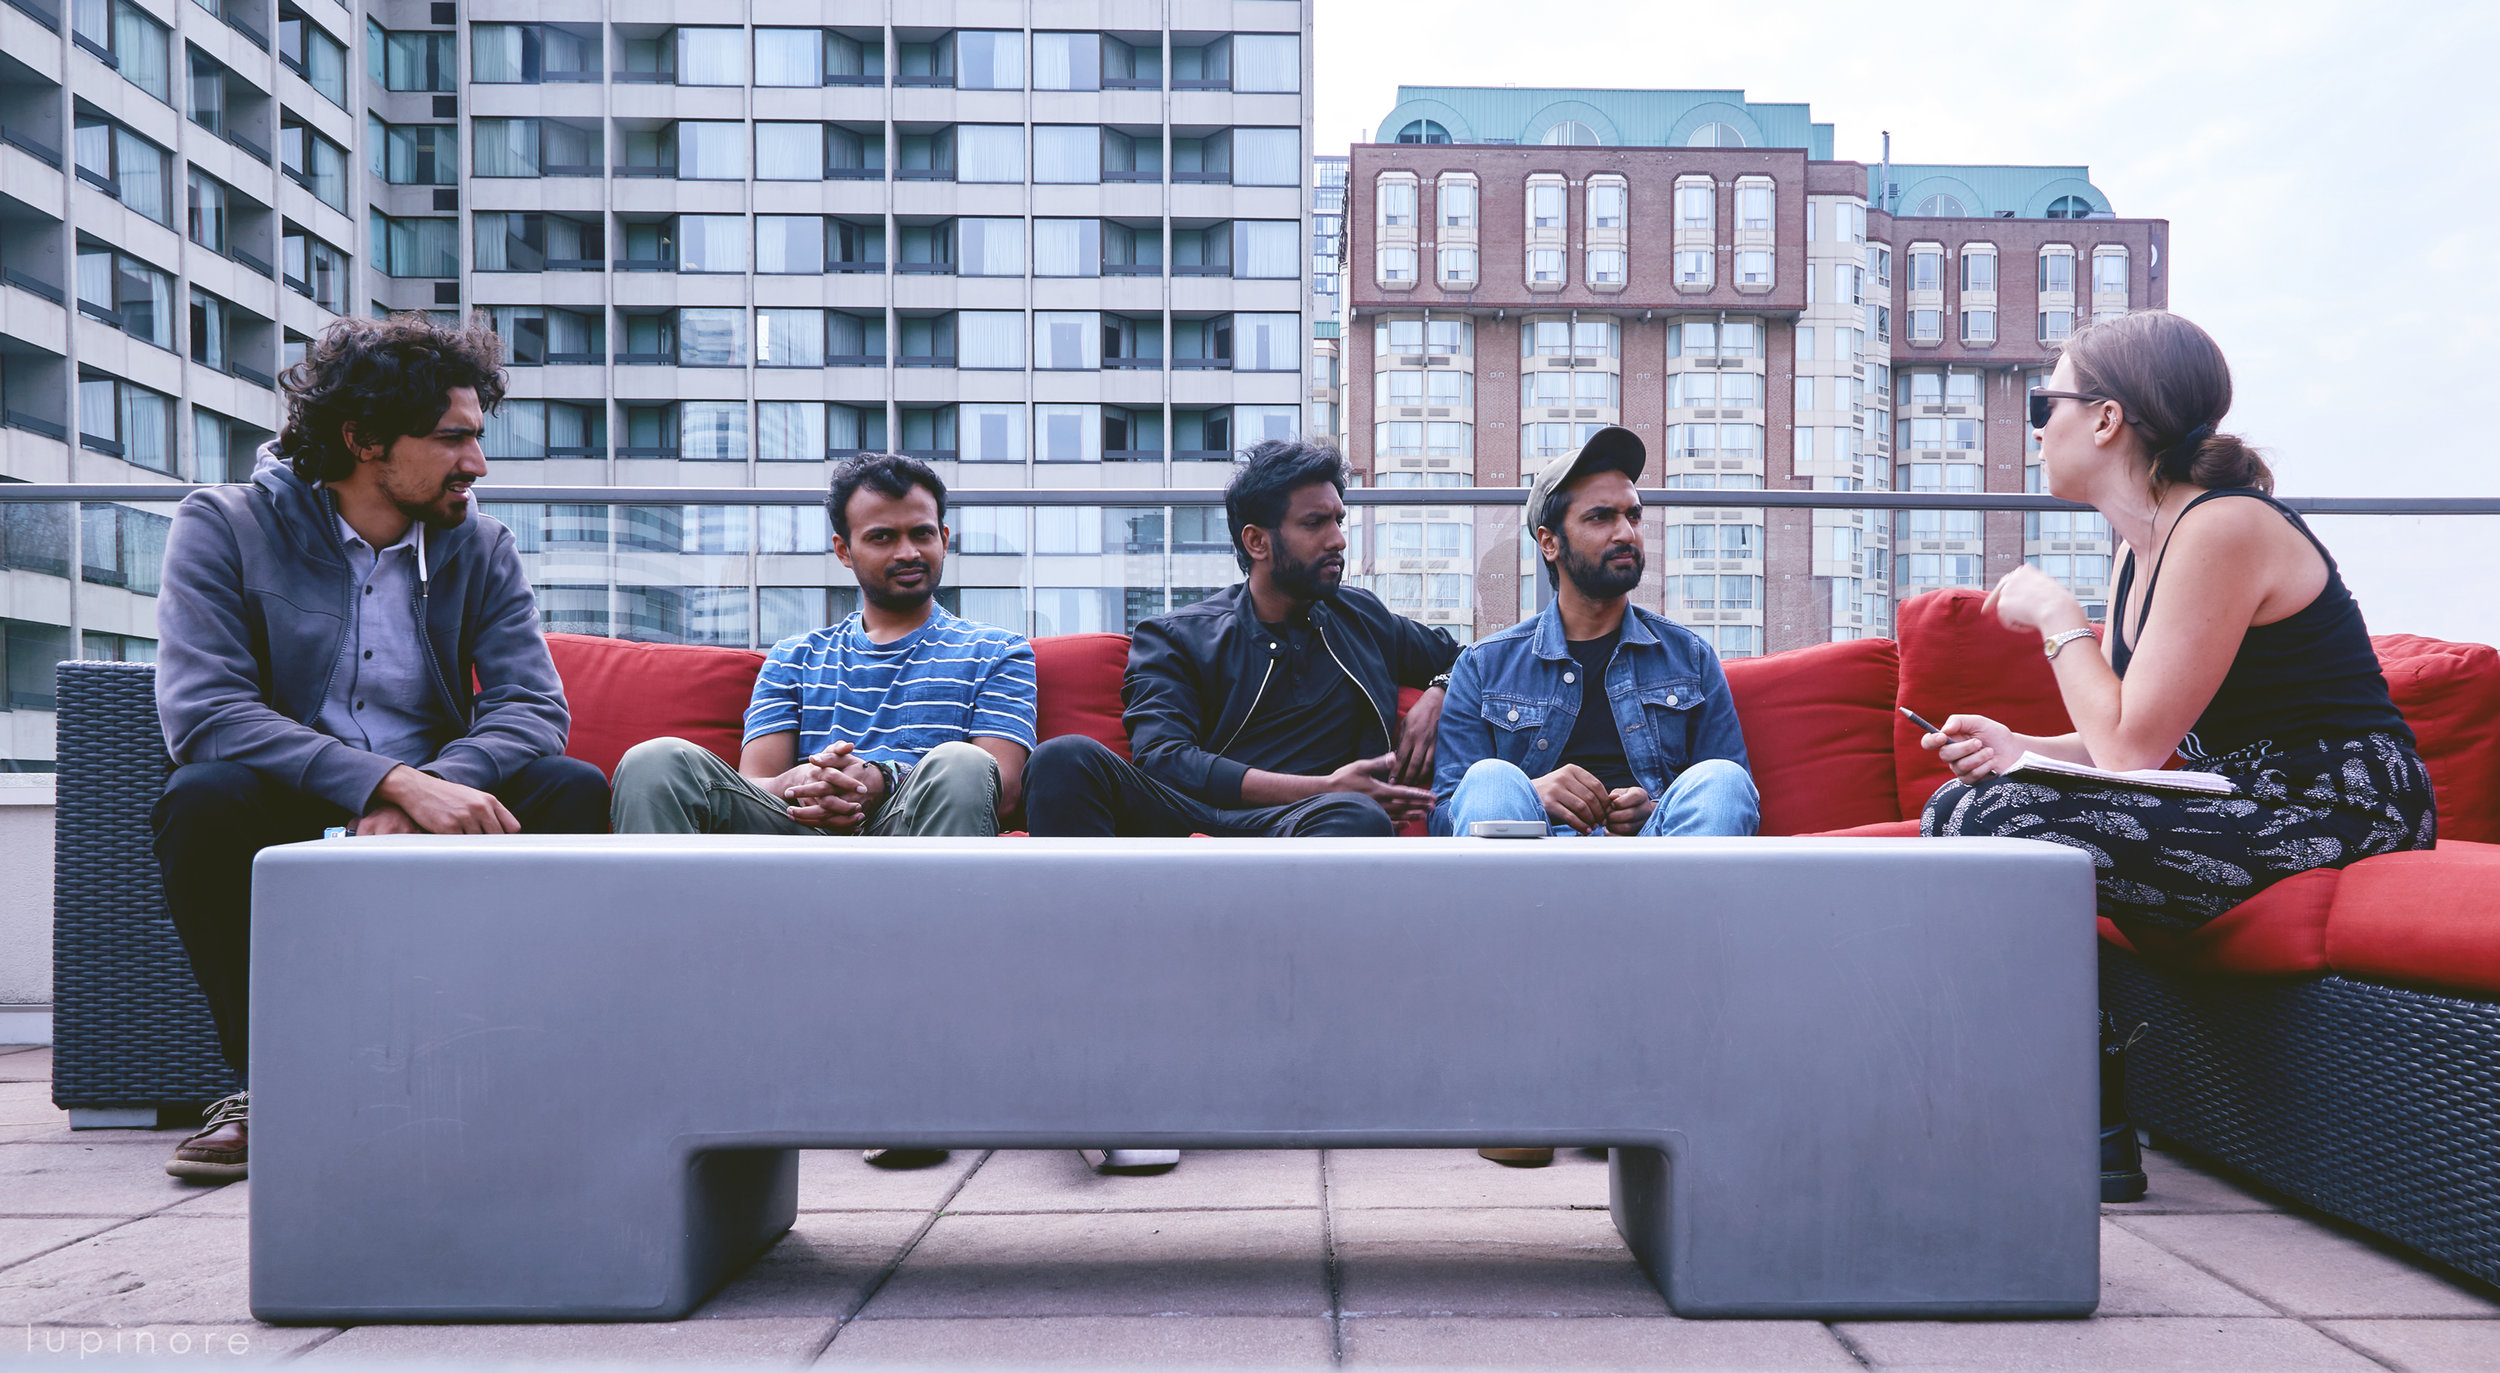 From left to right: Kashif Iqbal, Fidel D'Souza, Sachin Banandur, and Khalid Ahamed, Elle Côte photo cred:  Sambaranthony